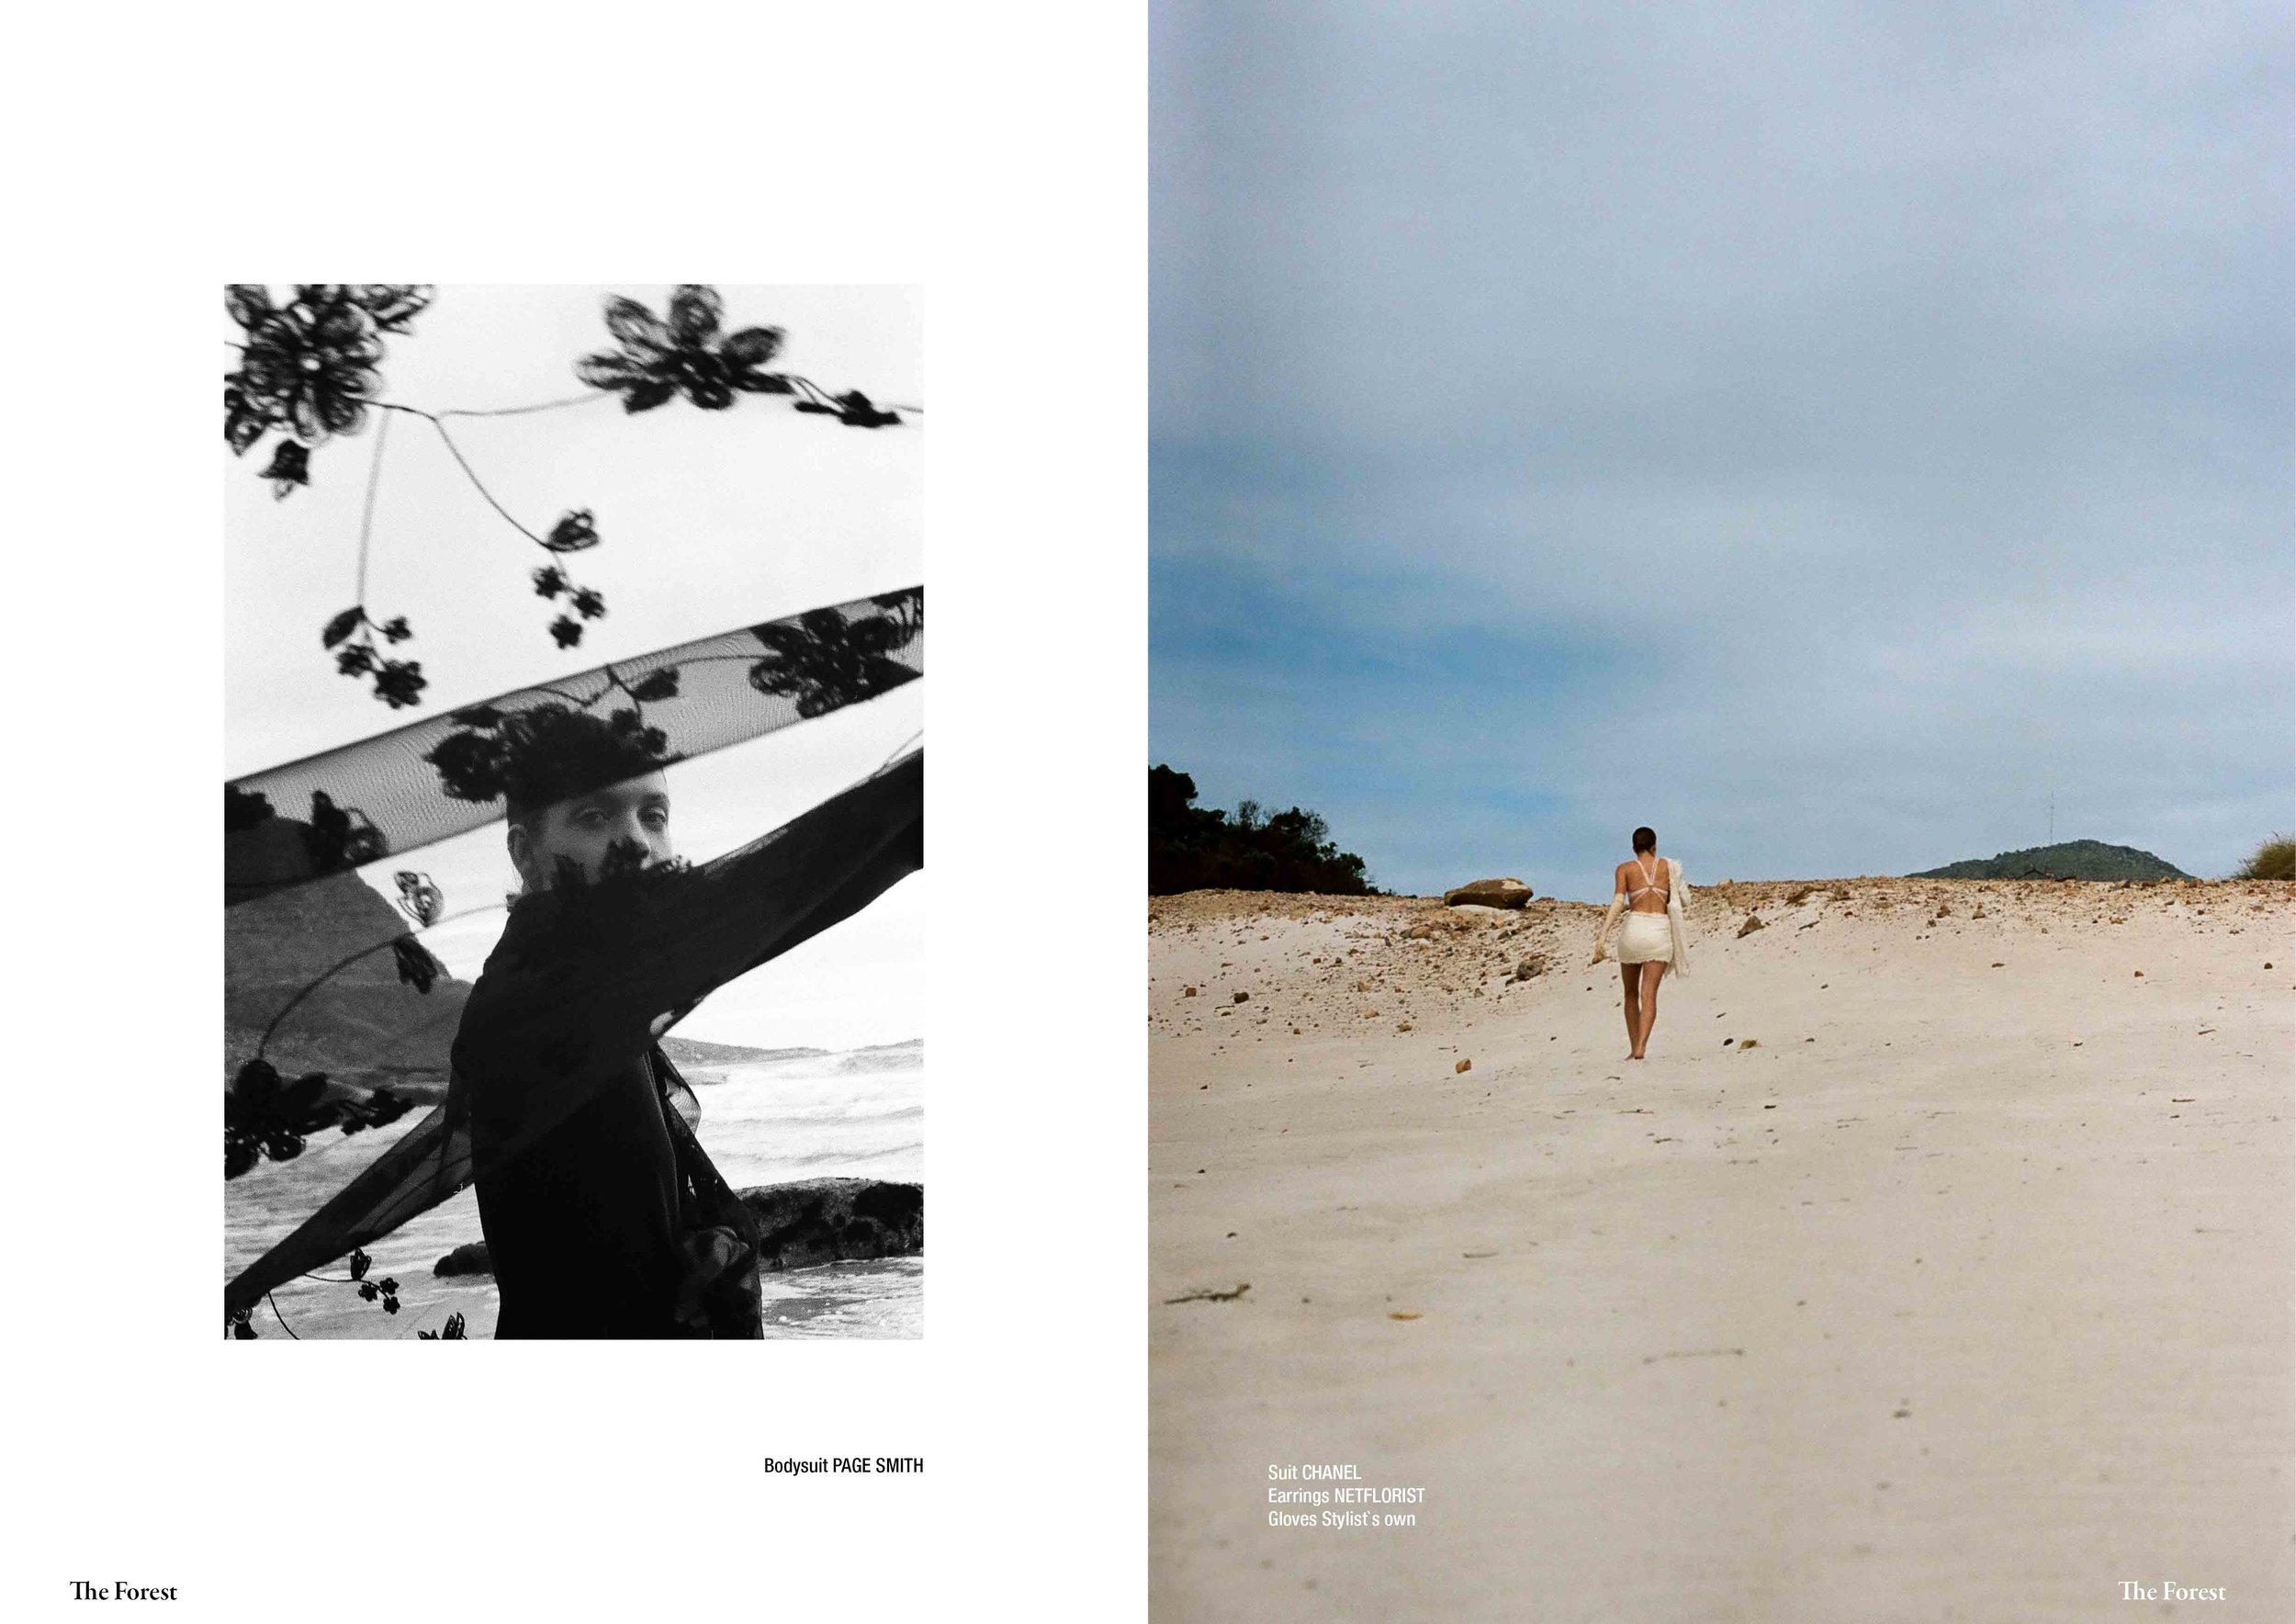 The_Forest_Detlef-Honigstein-Marolize-Southwood-Kimberly-Jane-Hunter-22.jpg